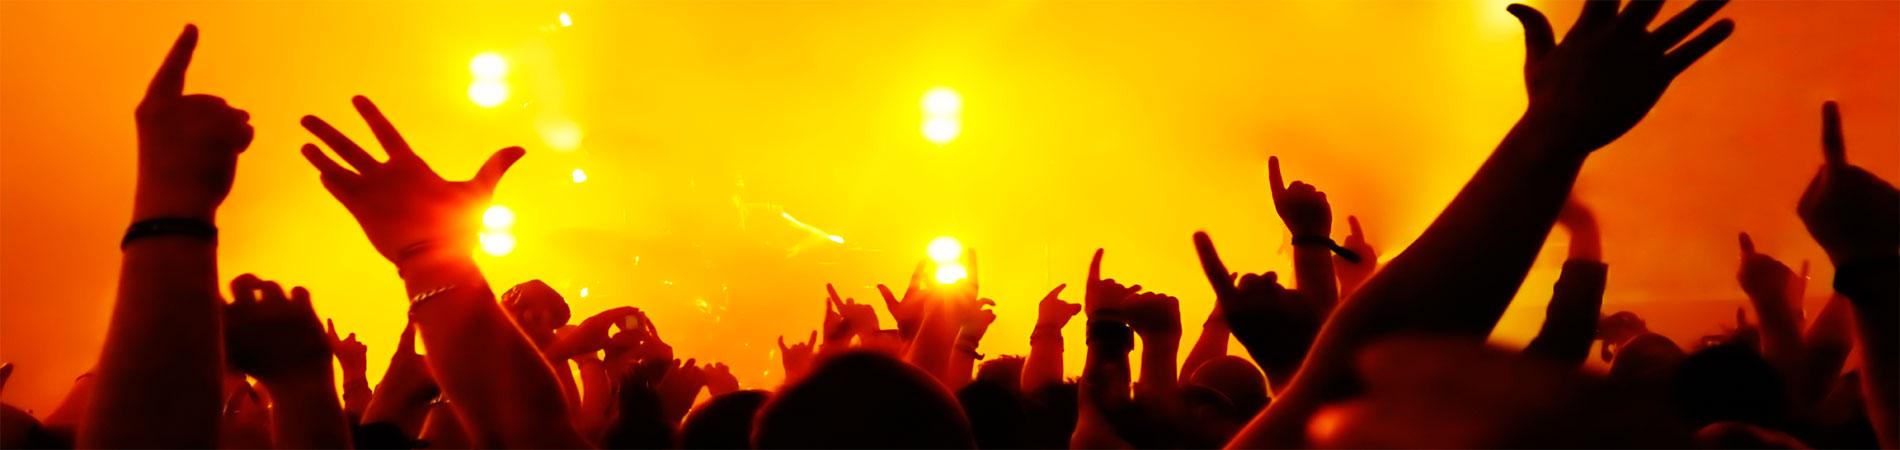 festival streaming live event company webcast band stream performance uk event streaming company